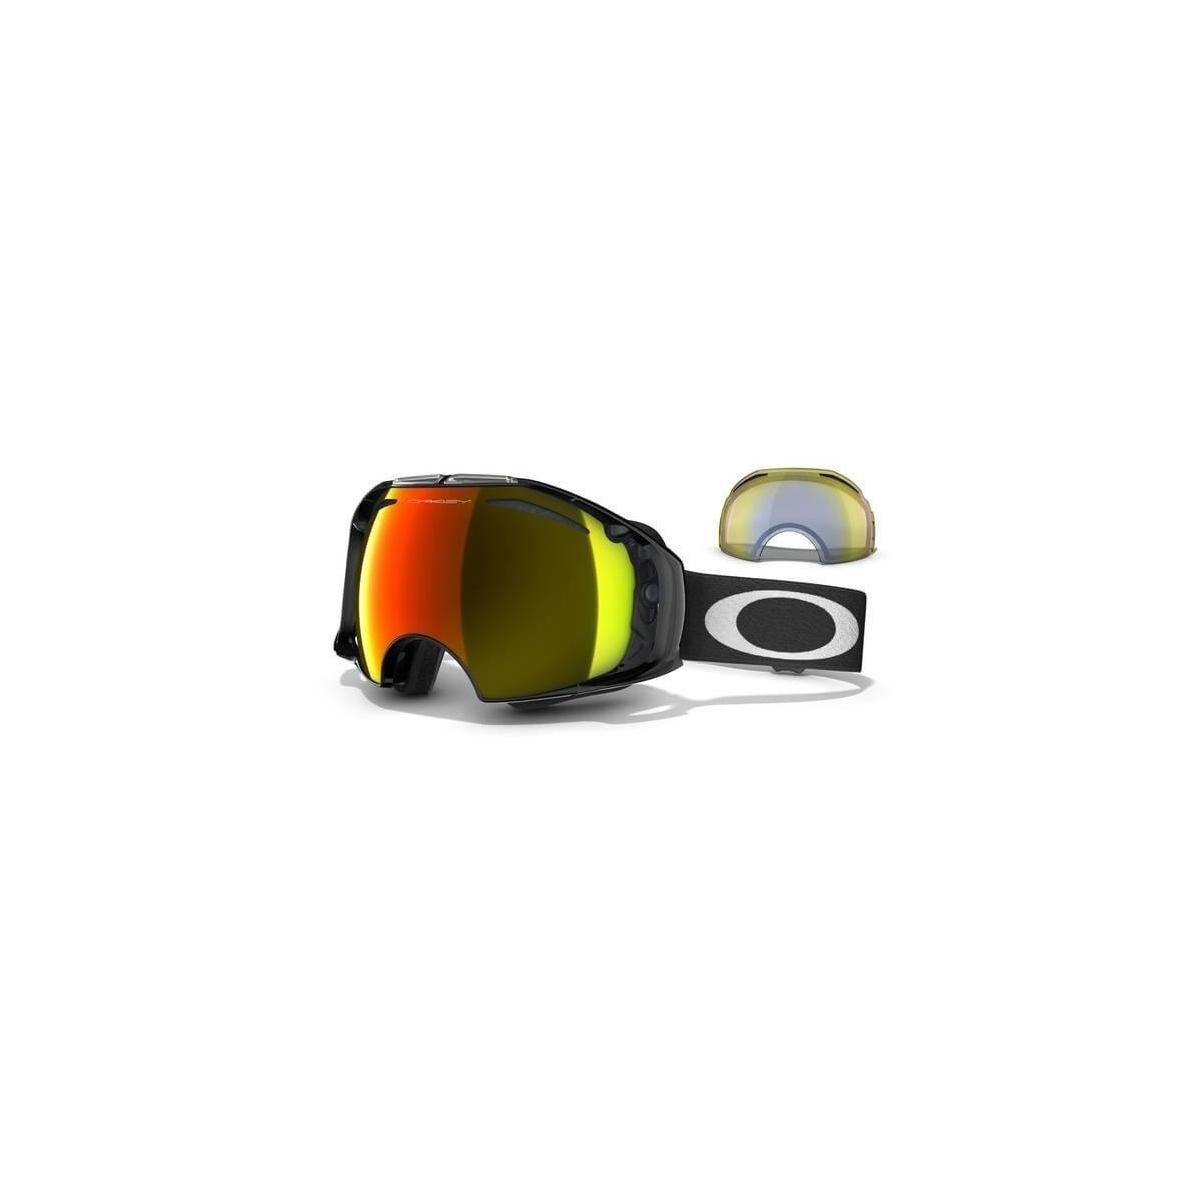 dbcc52fccb Masque Ski Oakley Airbrake Jet Black Fire et Hi Yellow   Alltricks.com